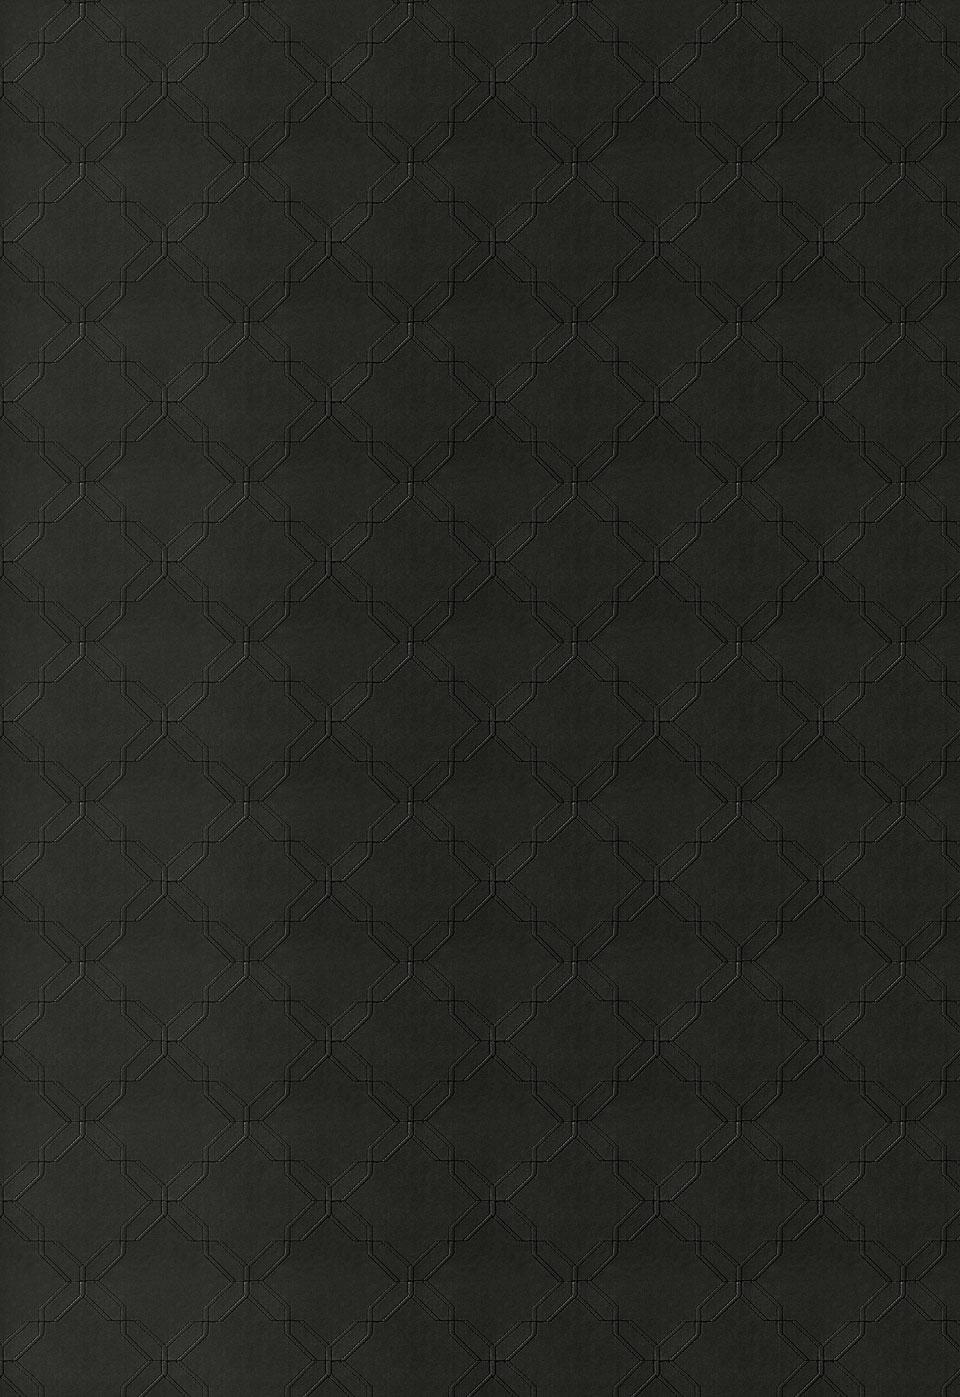 Американские обои Schumacher,  коллекция Luxe Lodge, артикул5006301